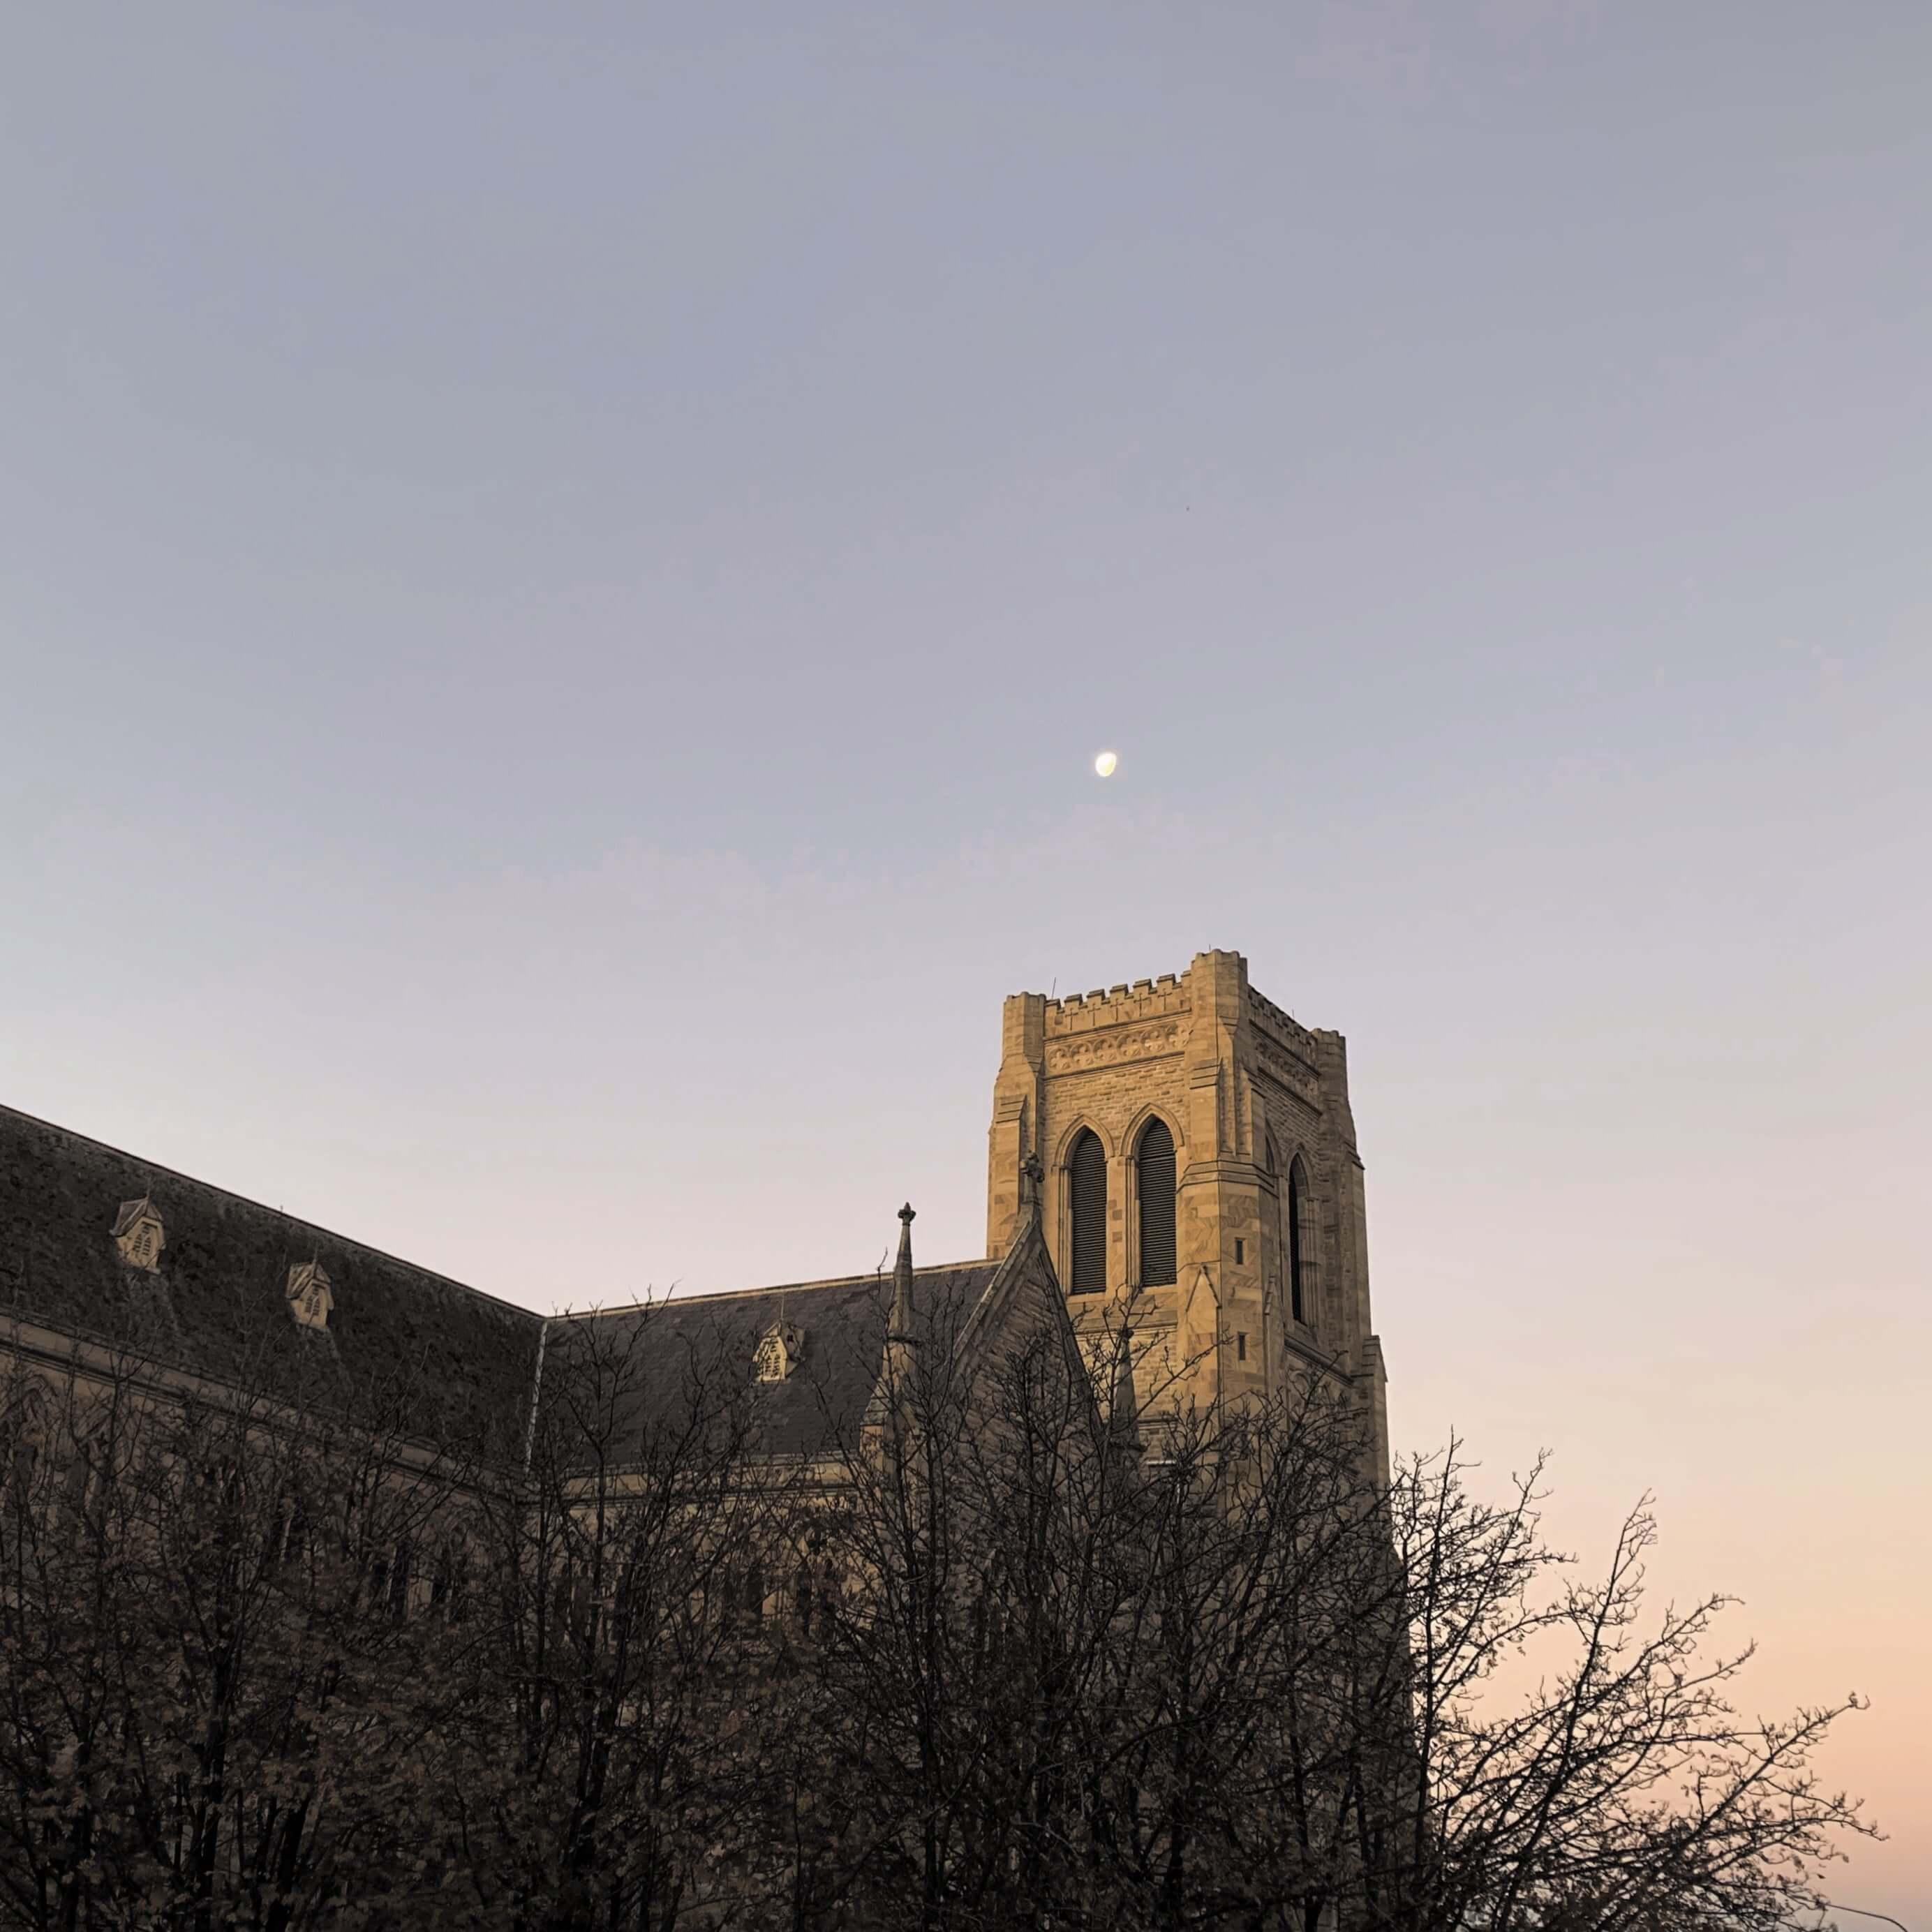 moon as seen over an old church